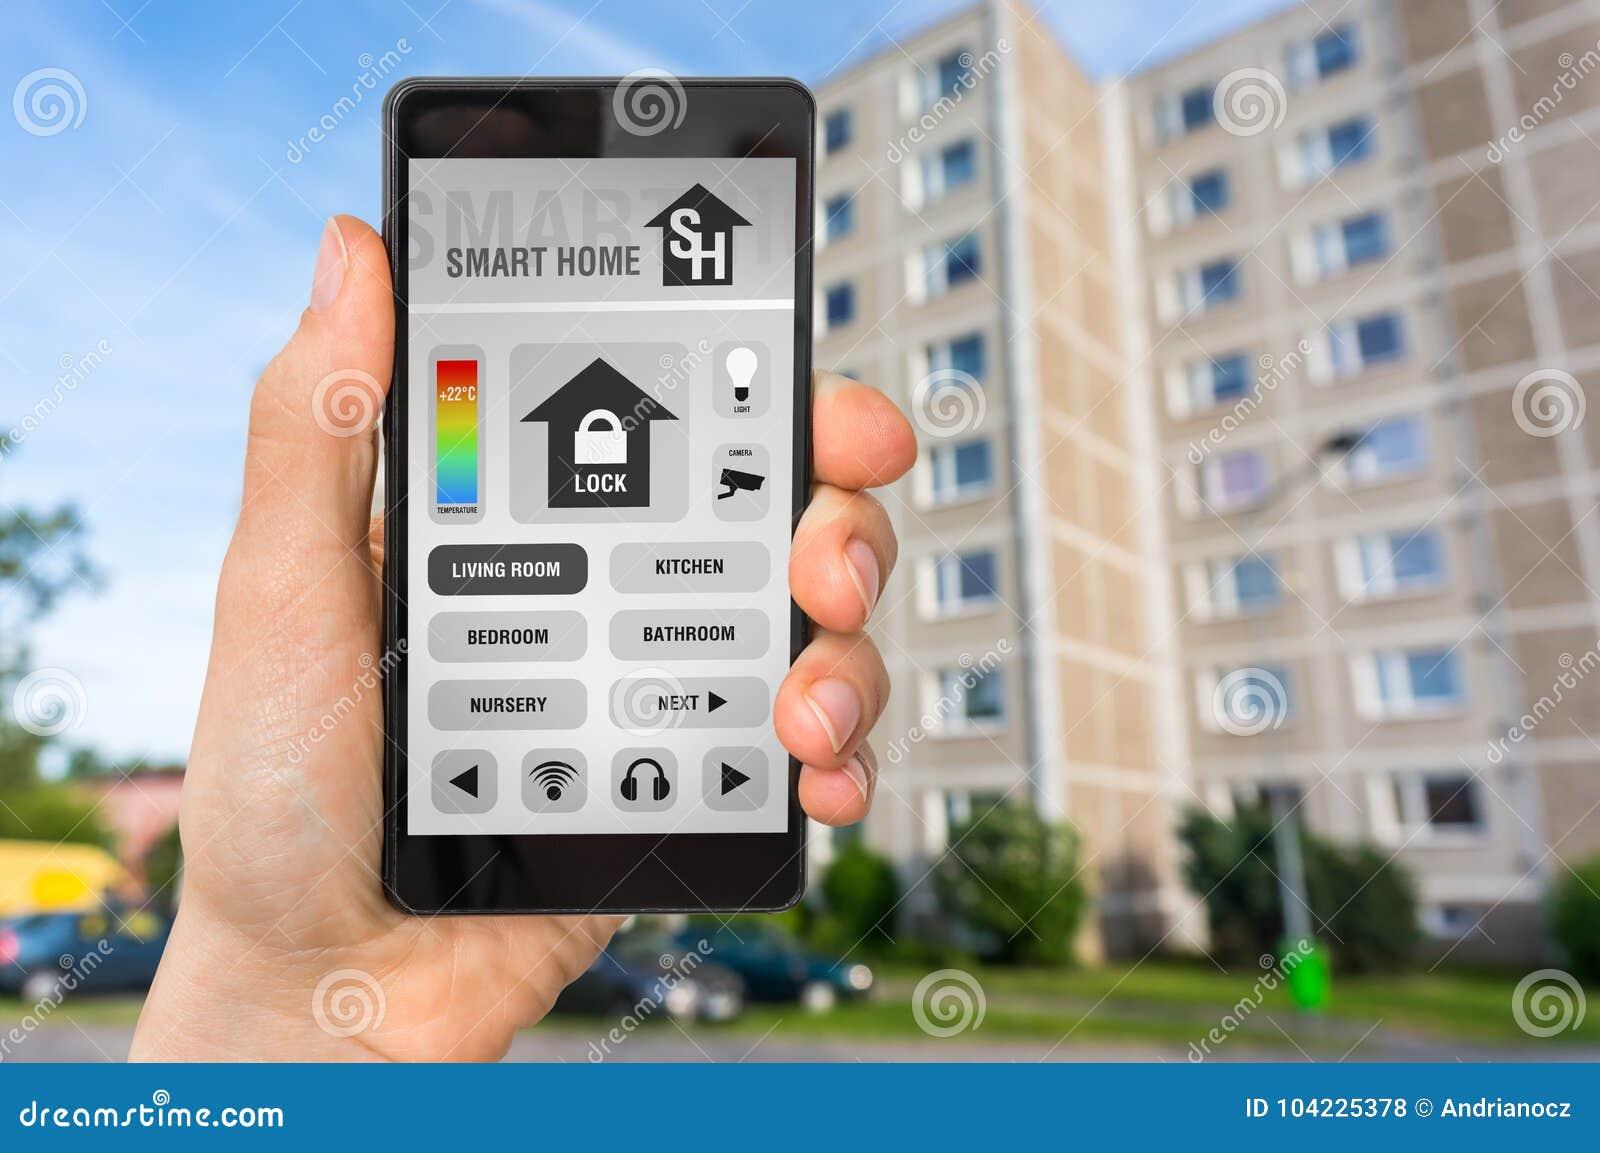 Smart Home Control App On Smartphone - Smart Home Concept Stock ...